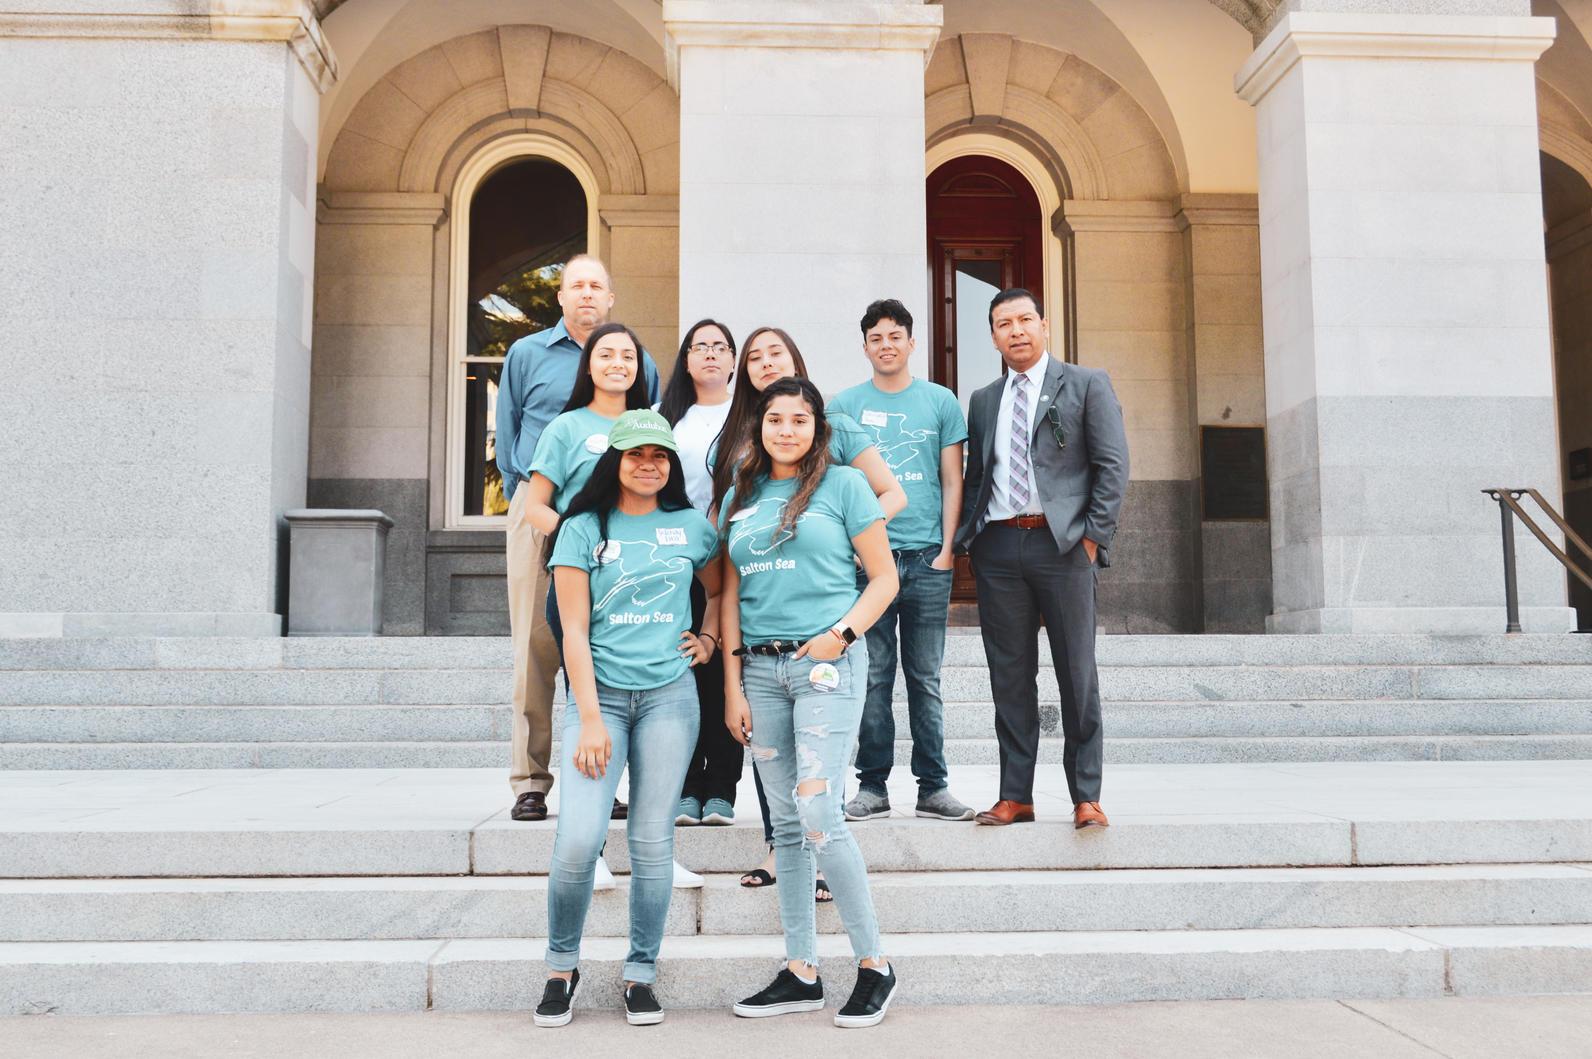 State Capitol Audubon Advocacy Day